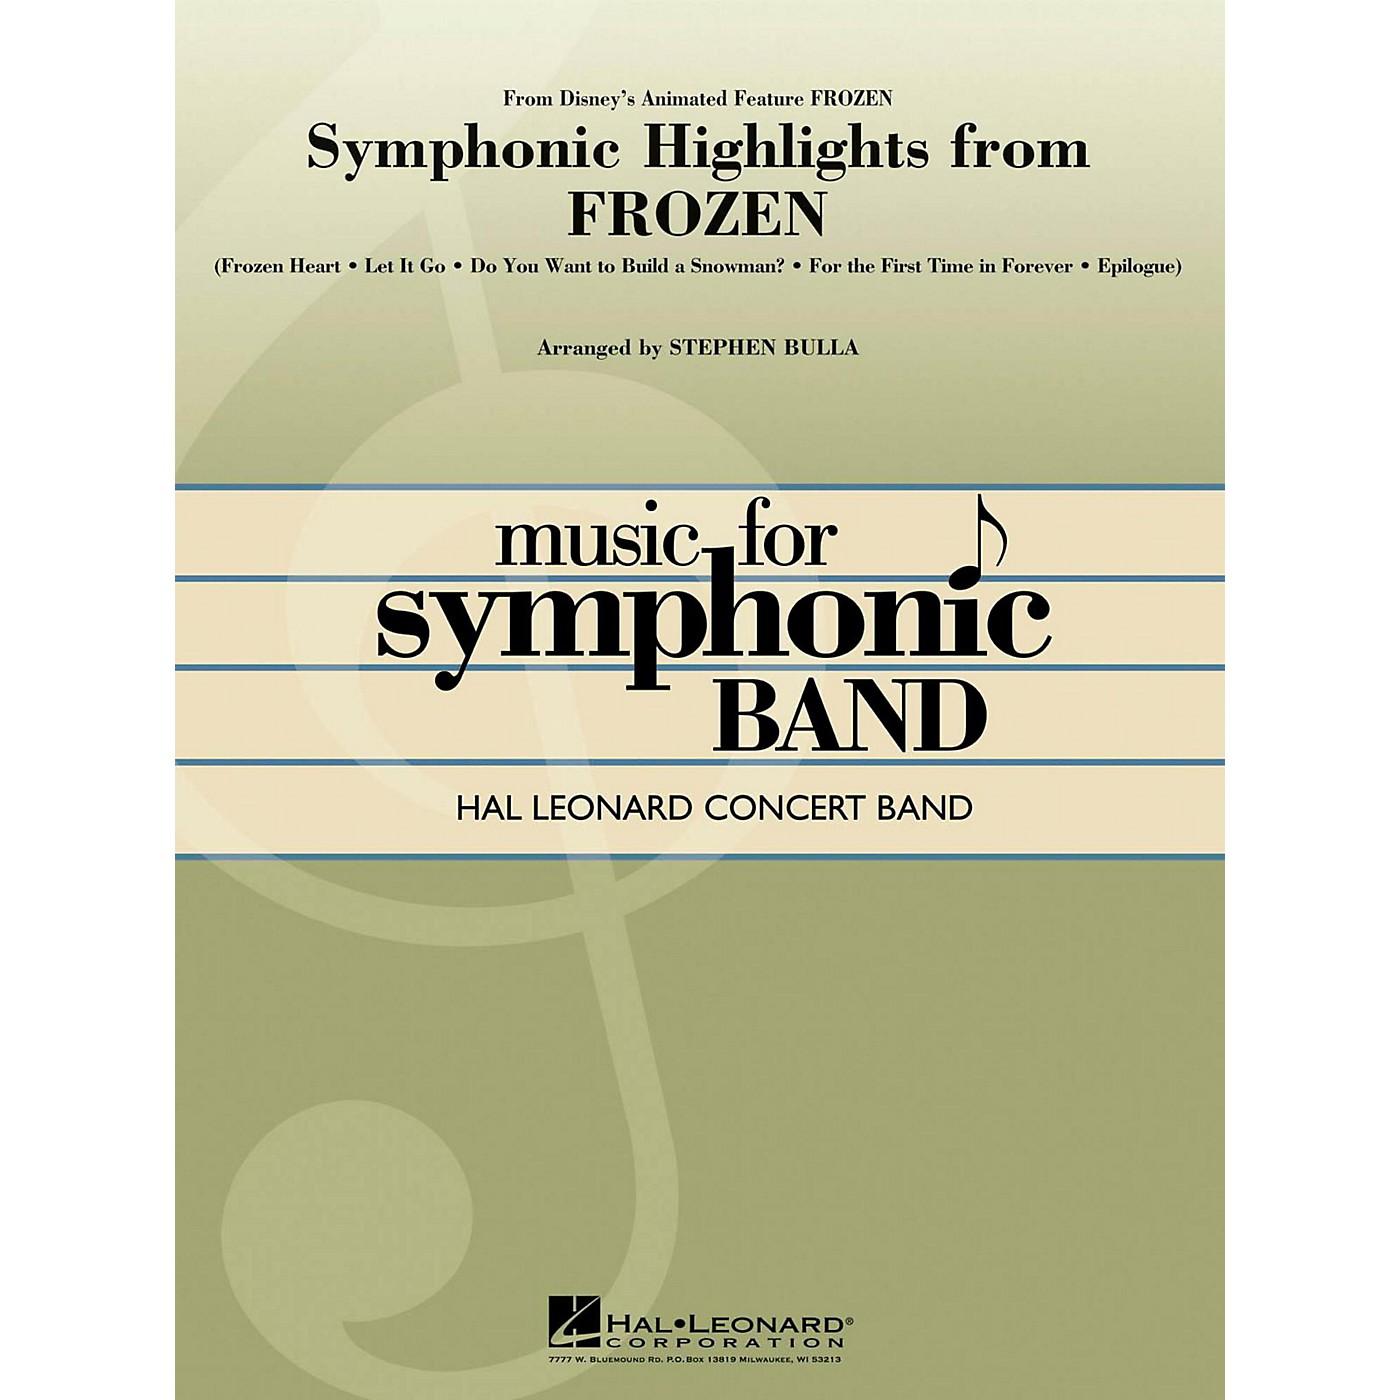 Hal Leonard Symphonic Highlights From Frozen Hal Leonard Concert Band Series Level 4 thumbnail